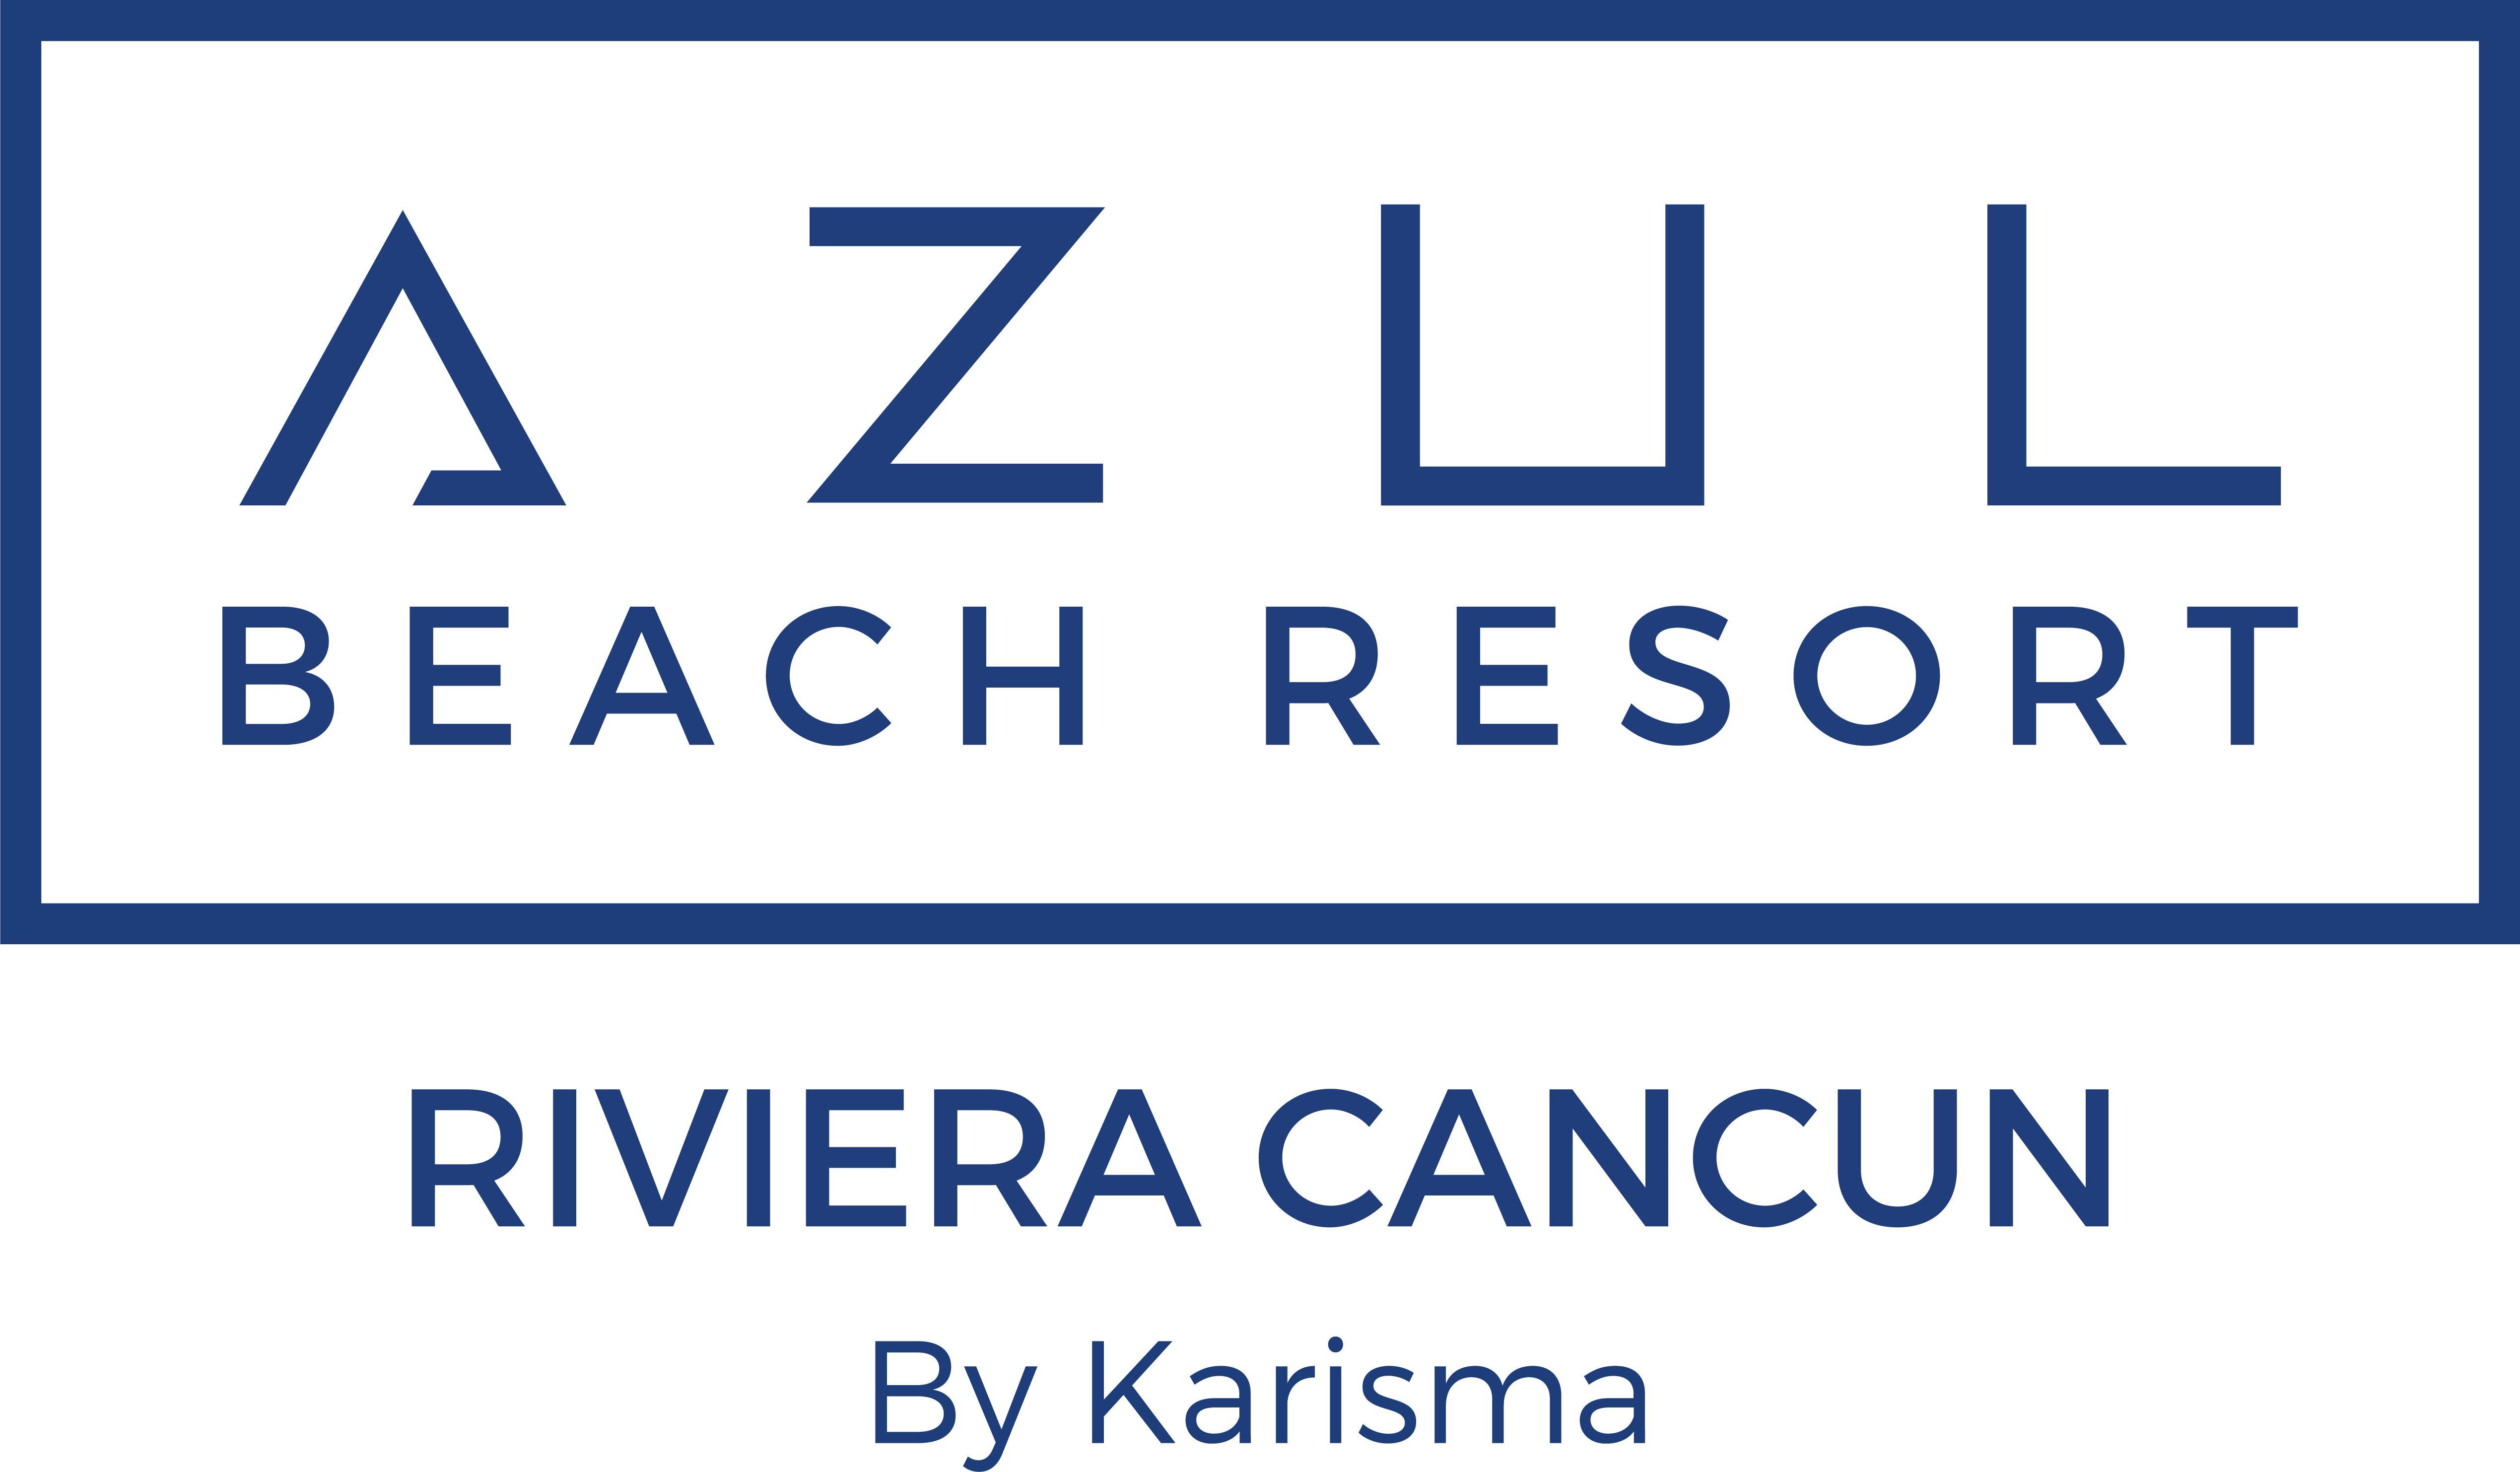 Hotel Azul Beach Resort Riviera Cancún By Karisma